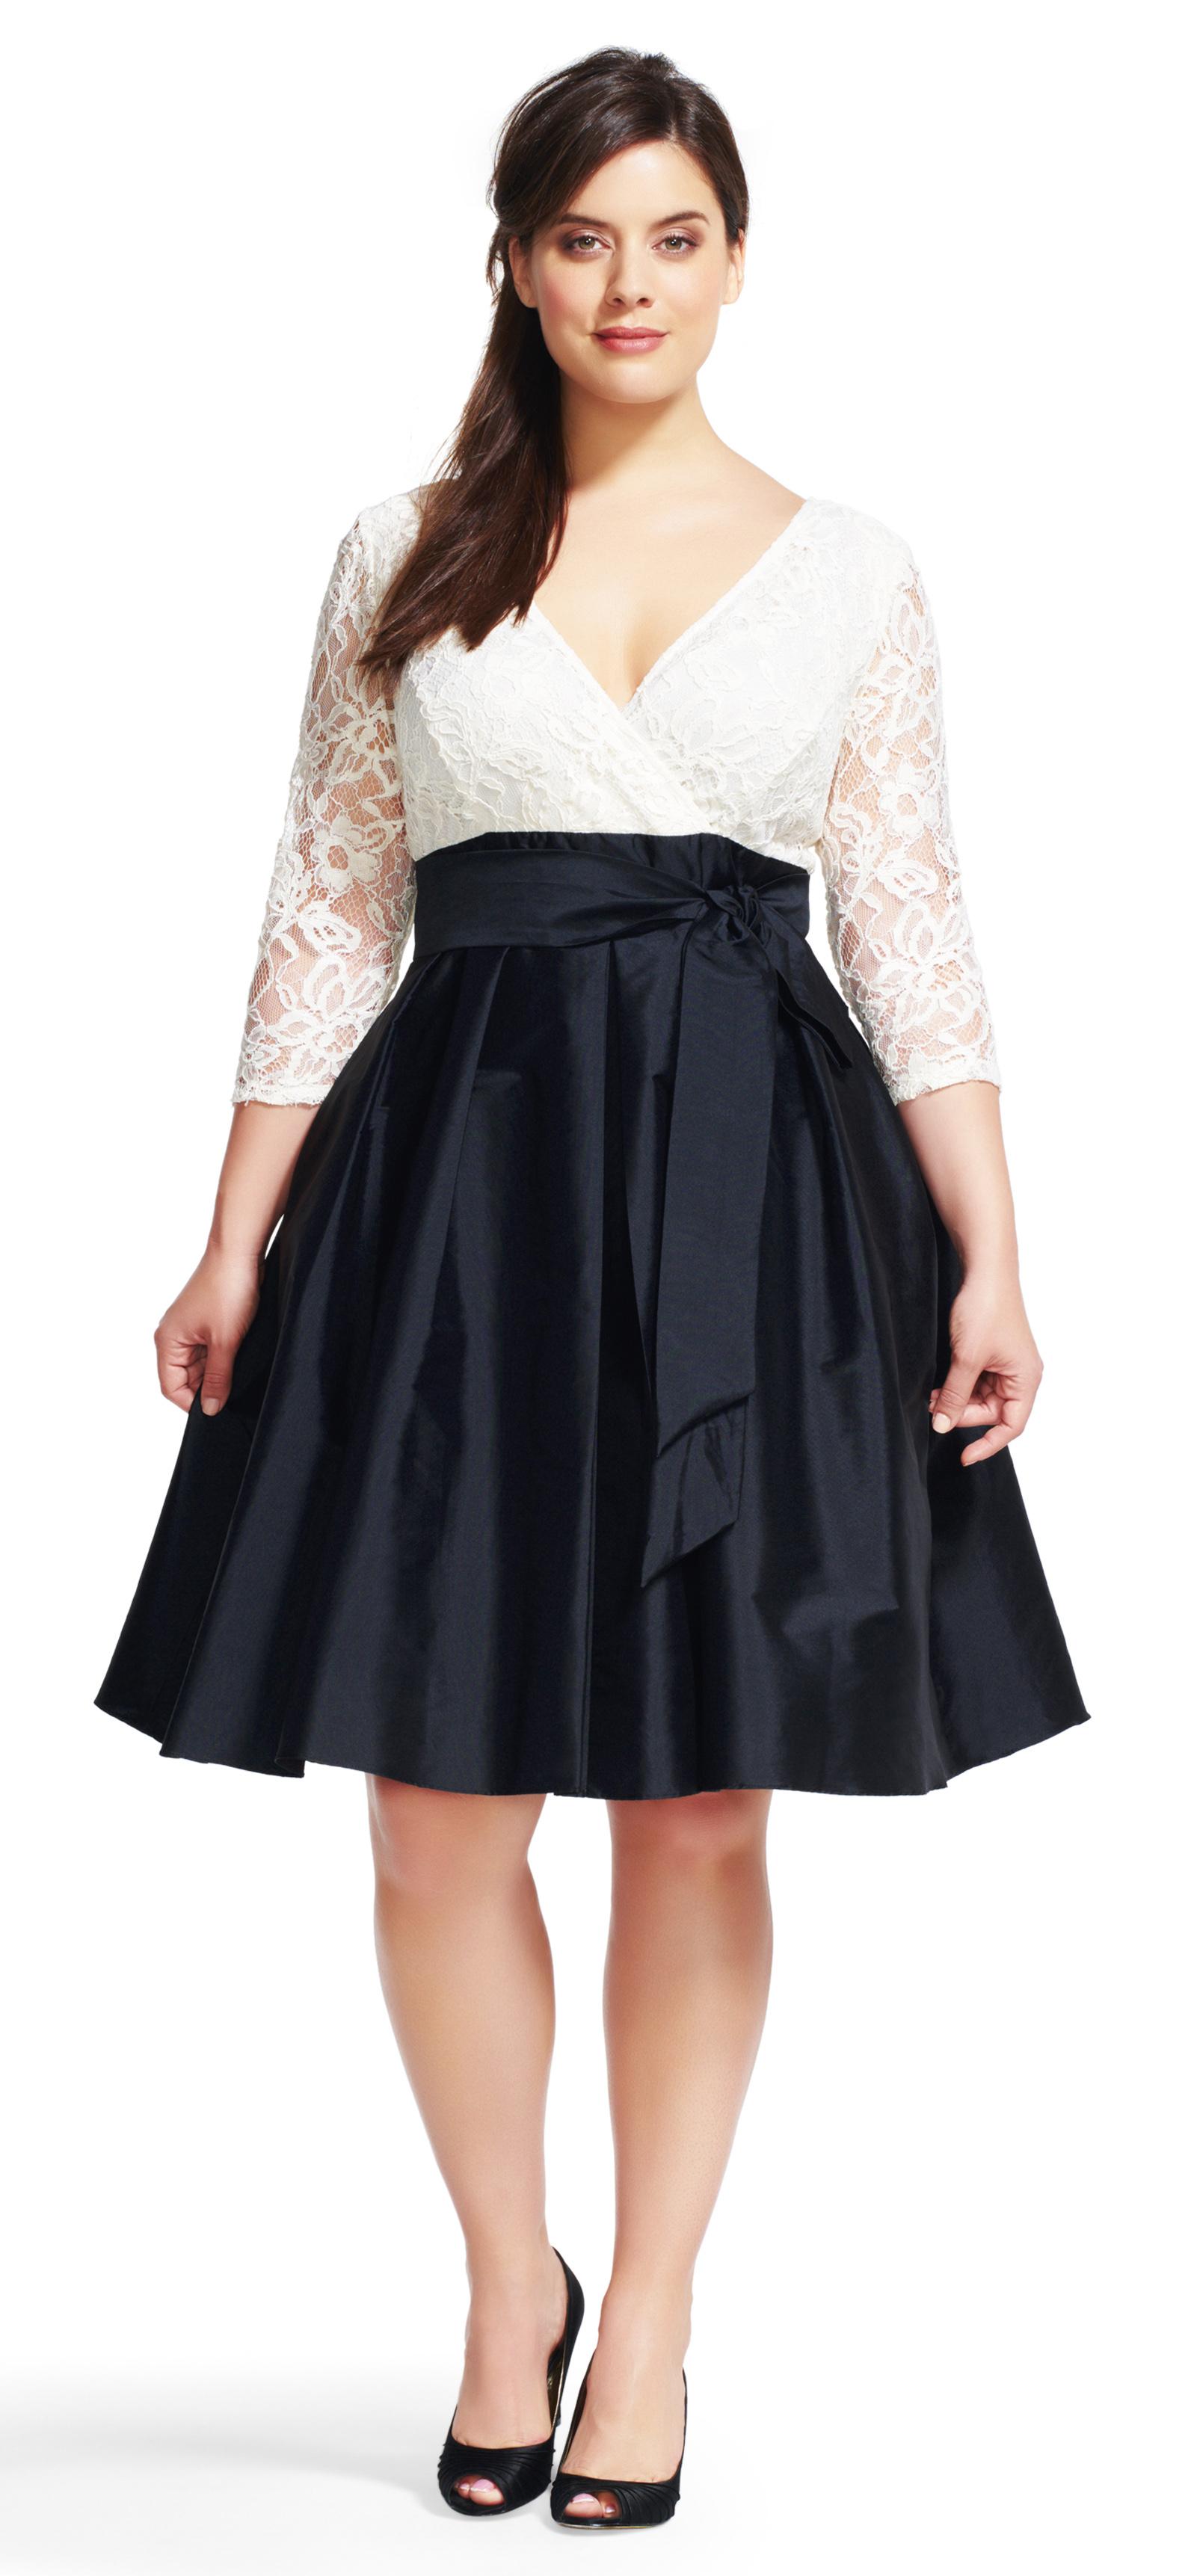 Plus size wedding guest dress sleeves alexawebb 217 13 Wedding guest dress 22